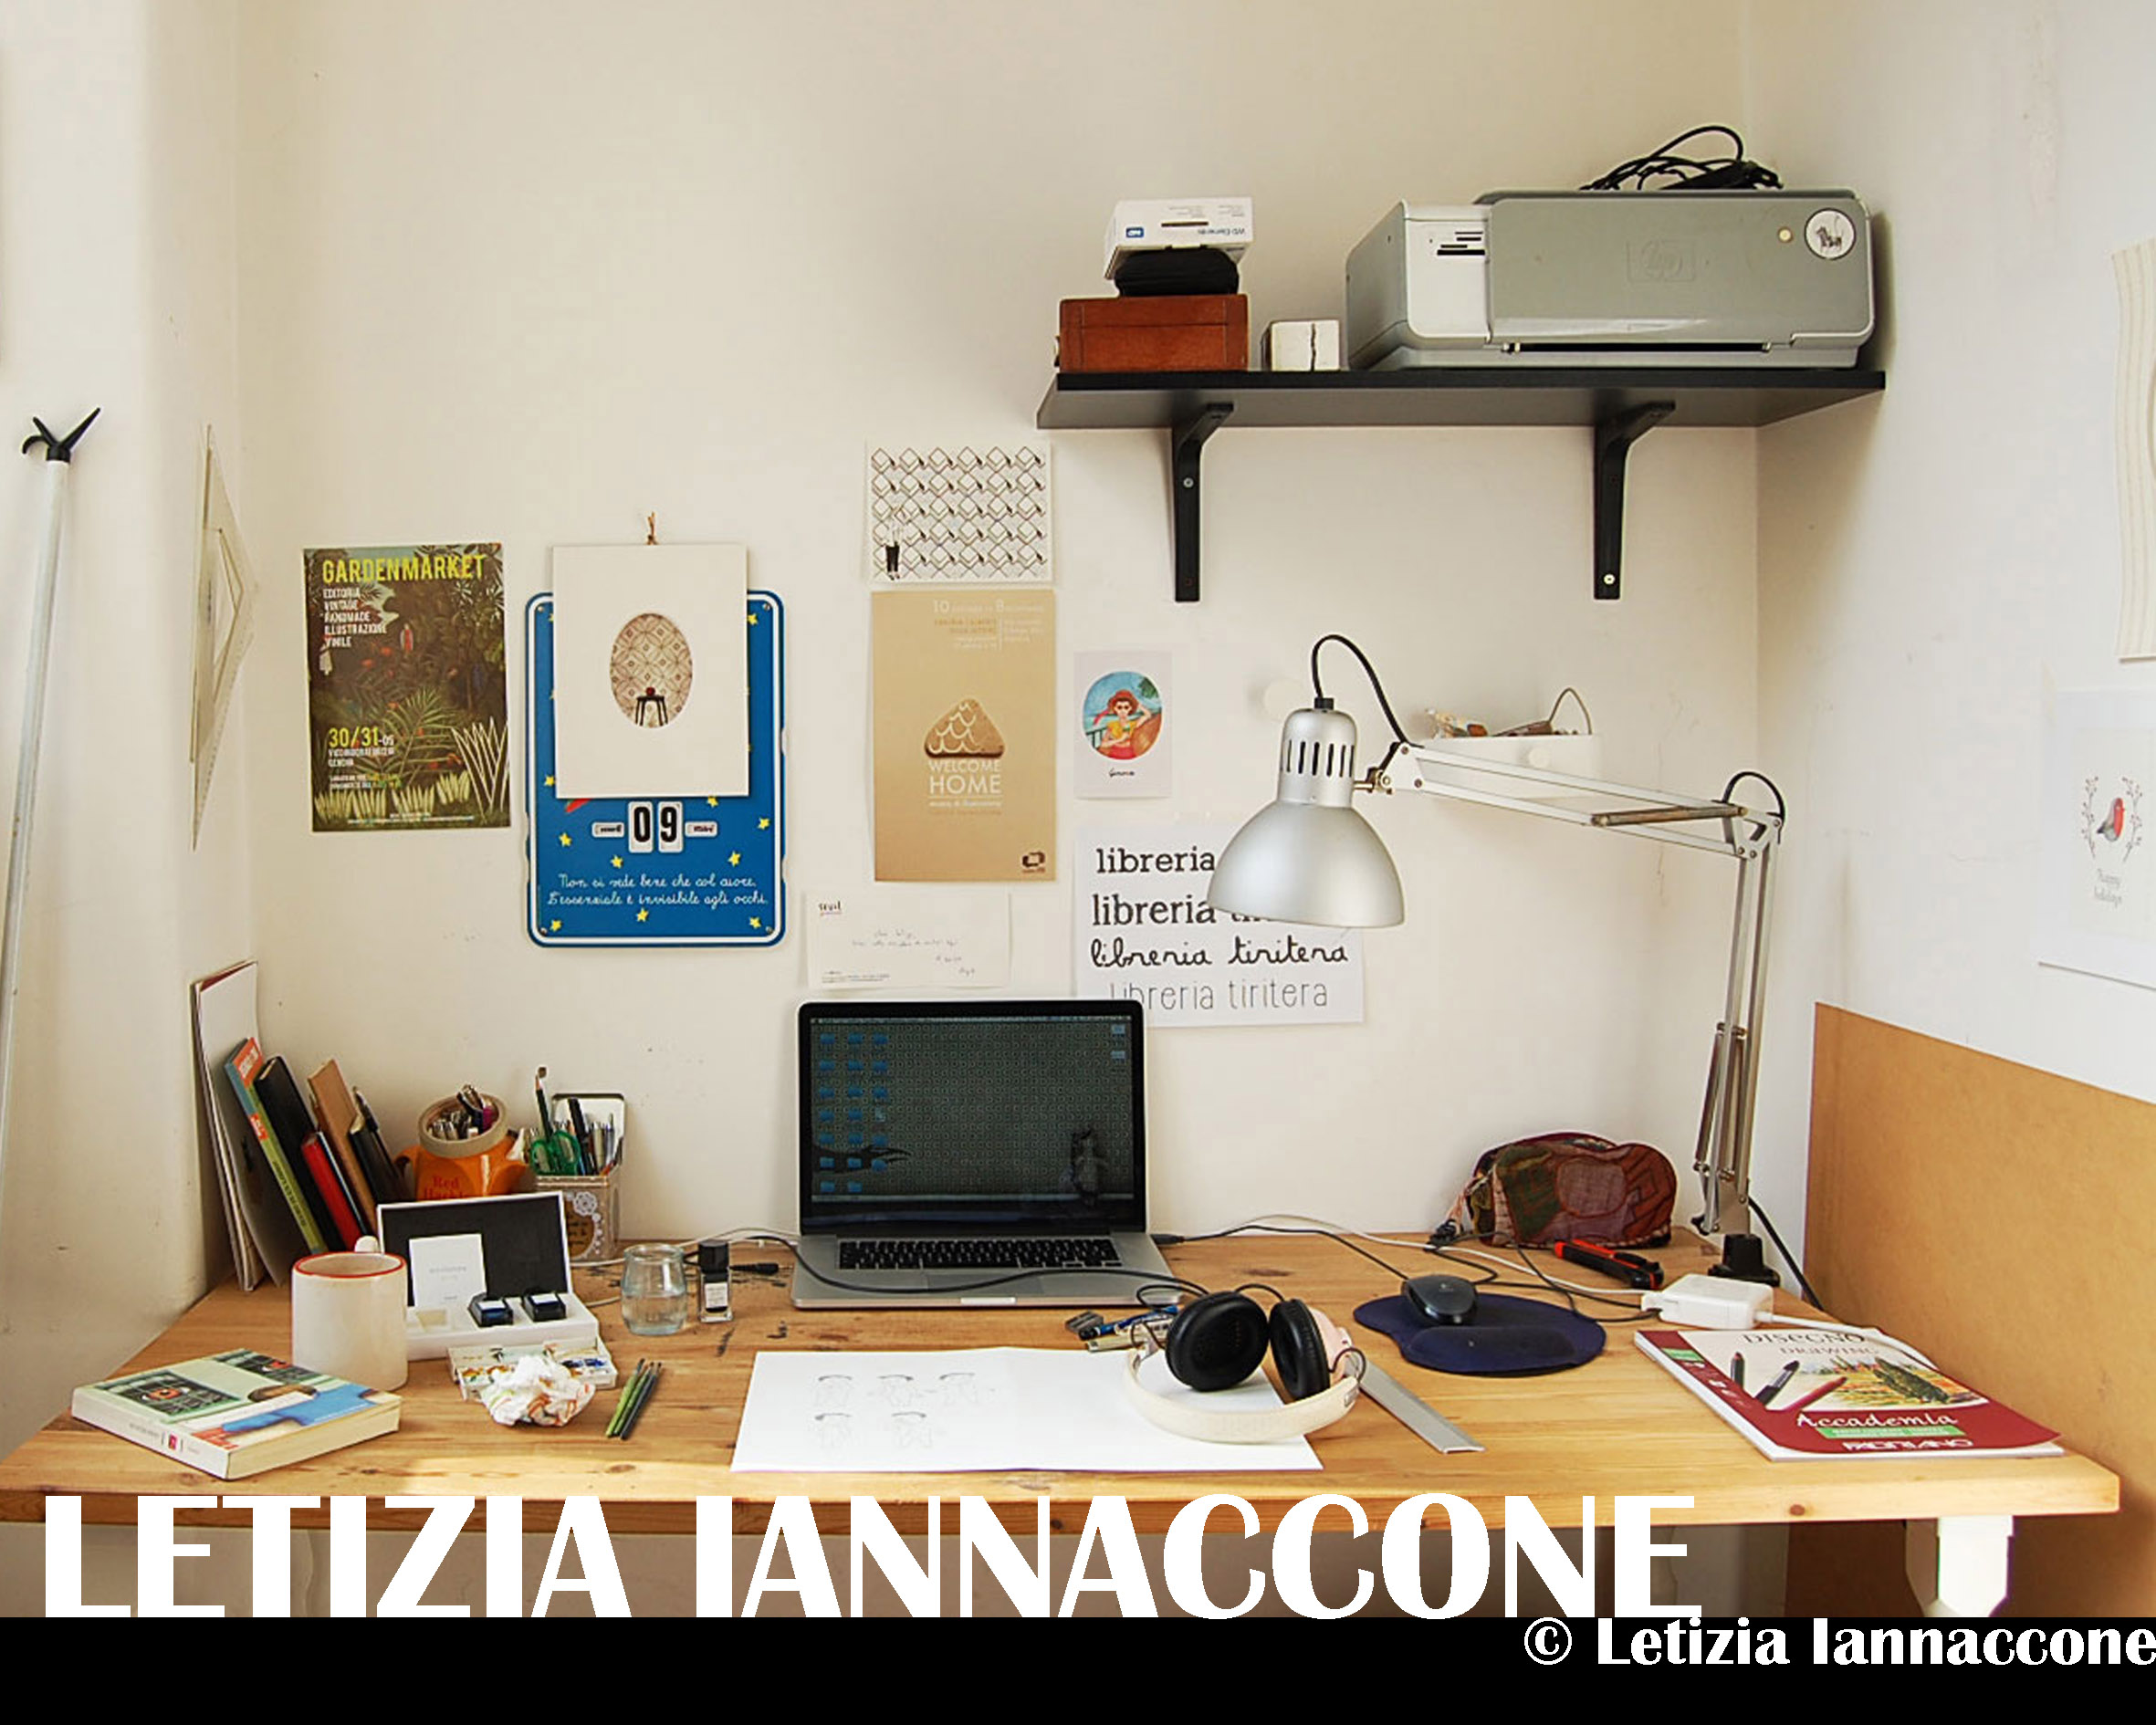 Letizia Iannaccone